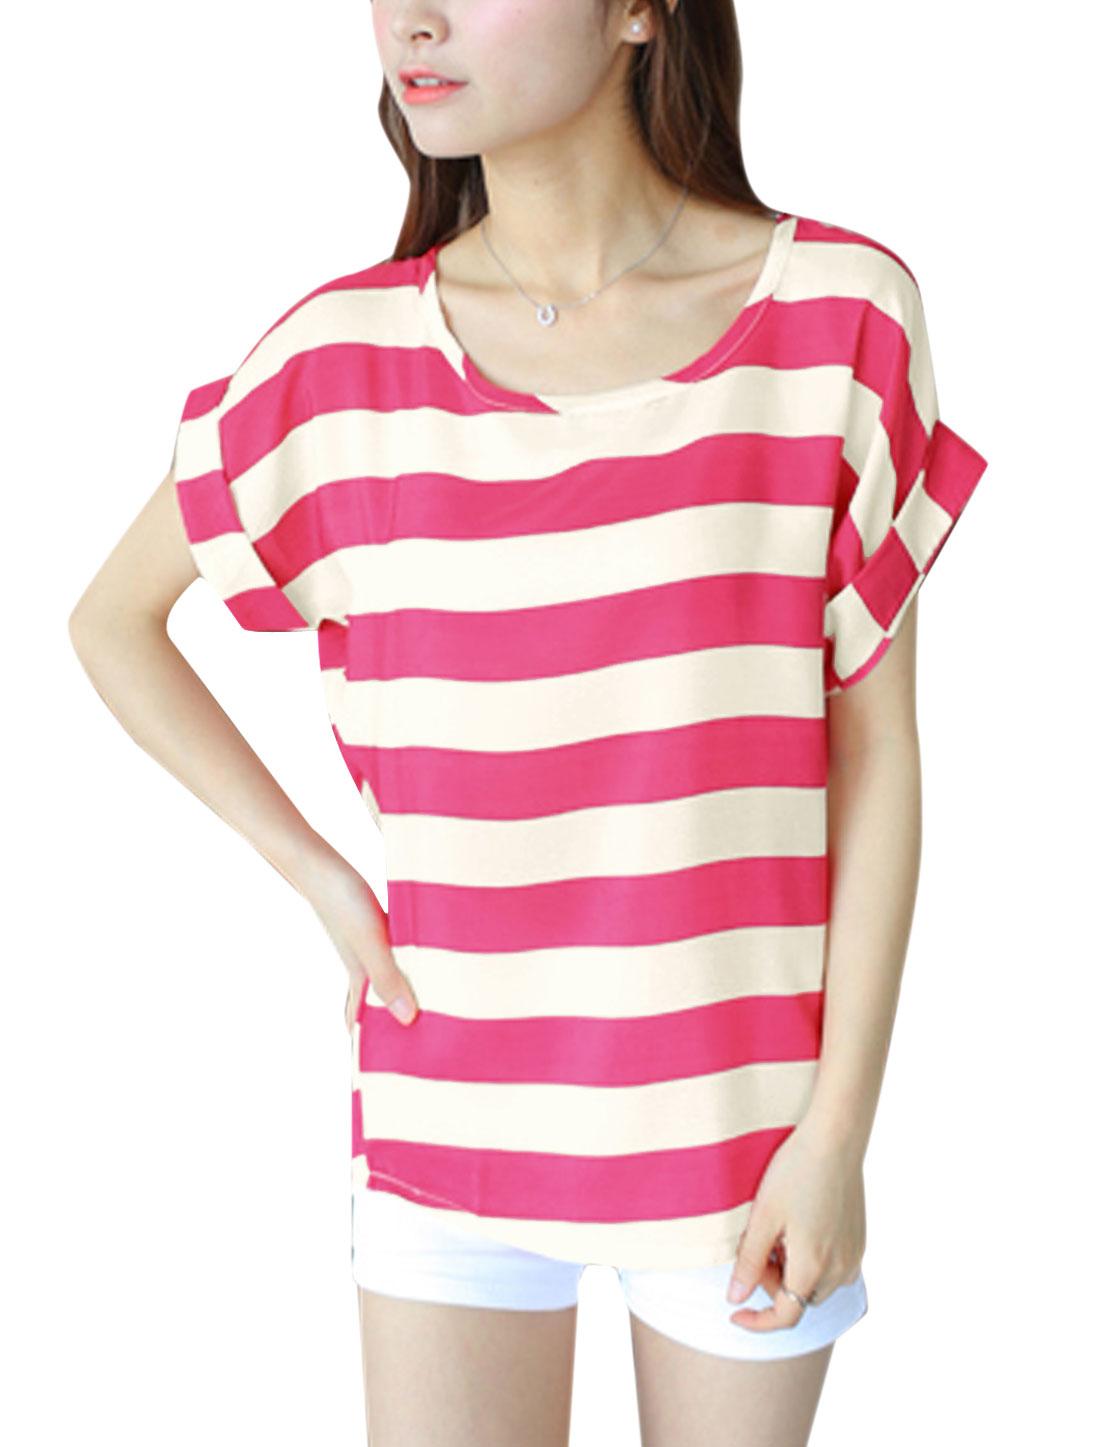 Lady Summer Short Batwing Sleeve Stripes T-Shirt Fuchsia XS